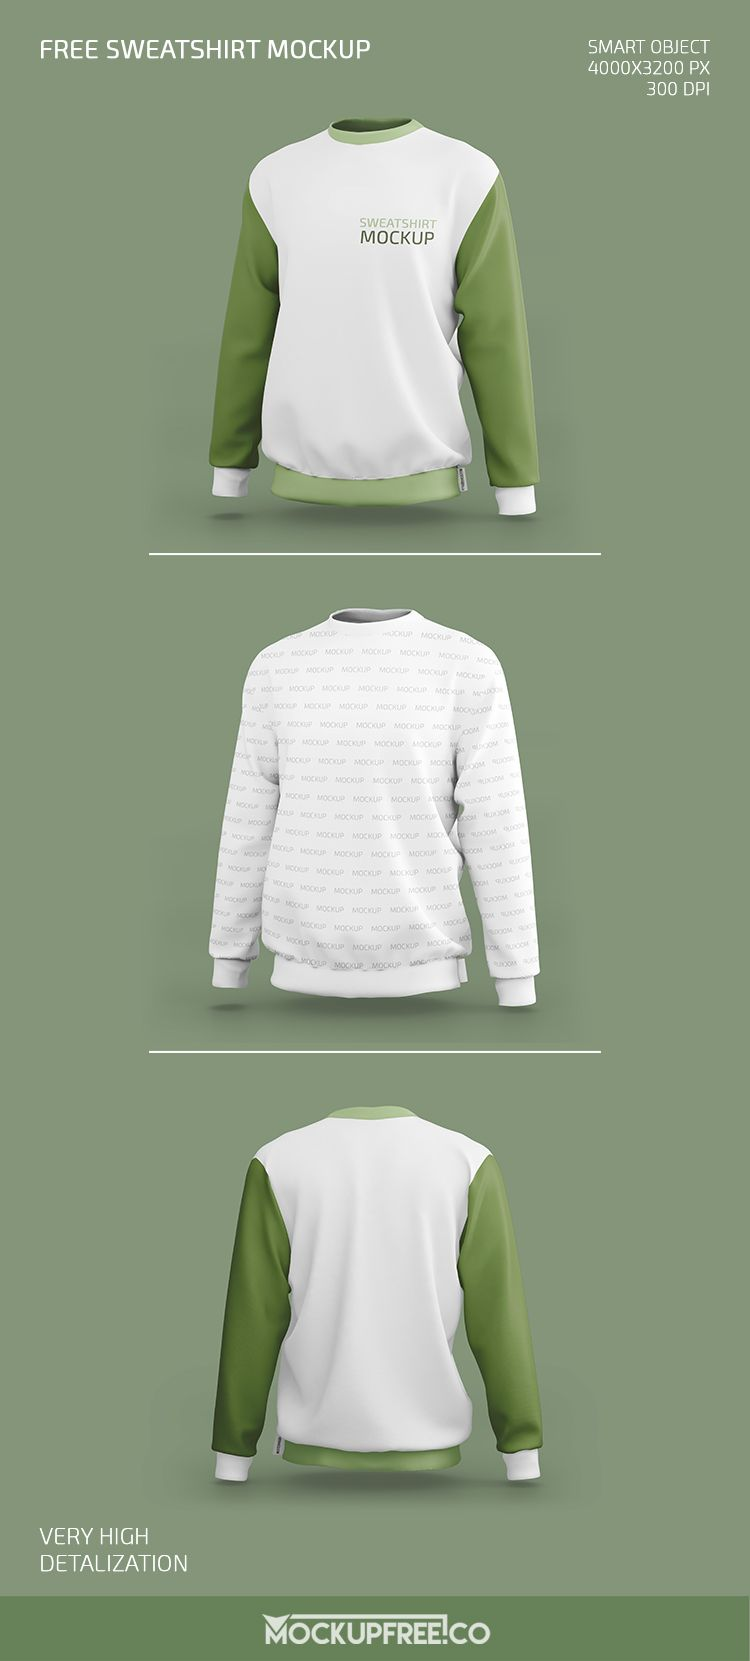 Free Sweatshirt Mockup In Psd Mockupfree Co Clothing Mockup Clothes Mockup Free Branding Mockups Free